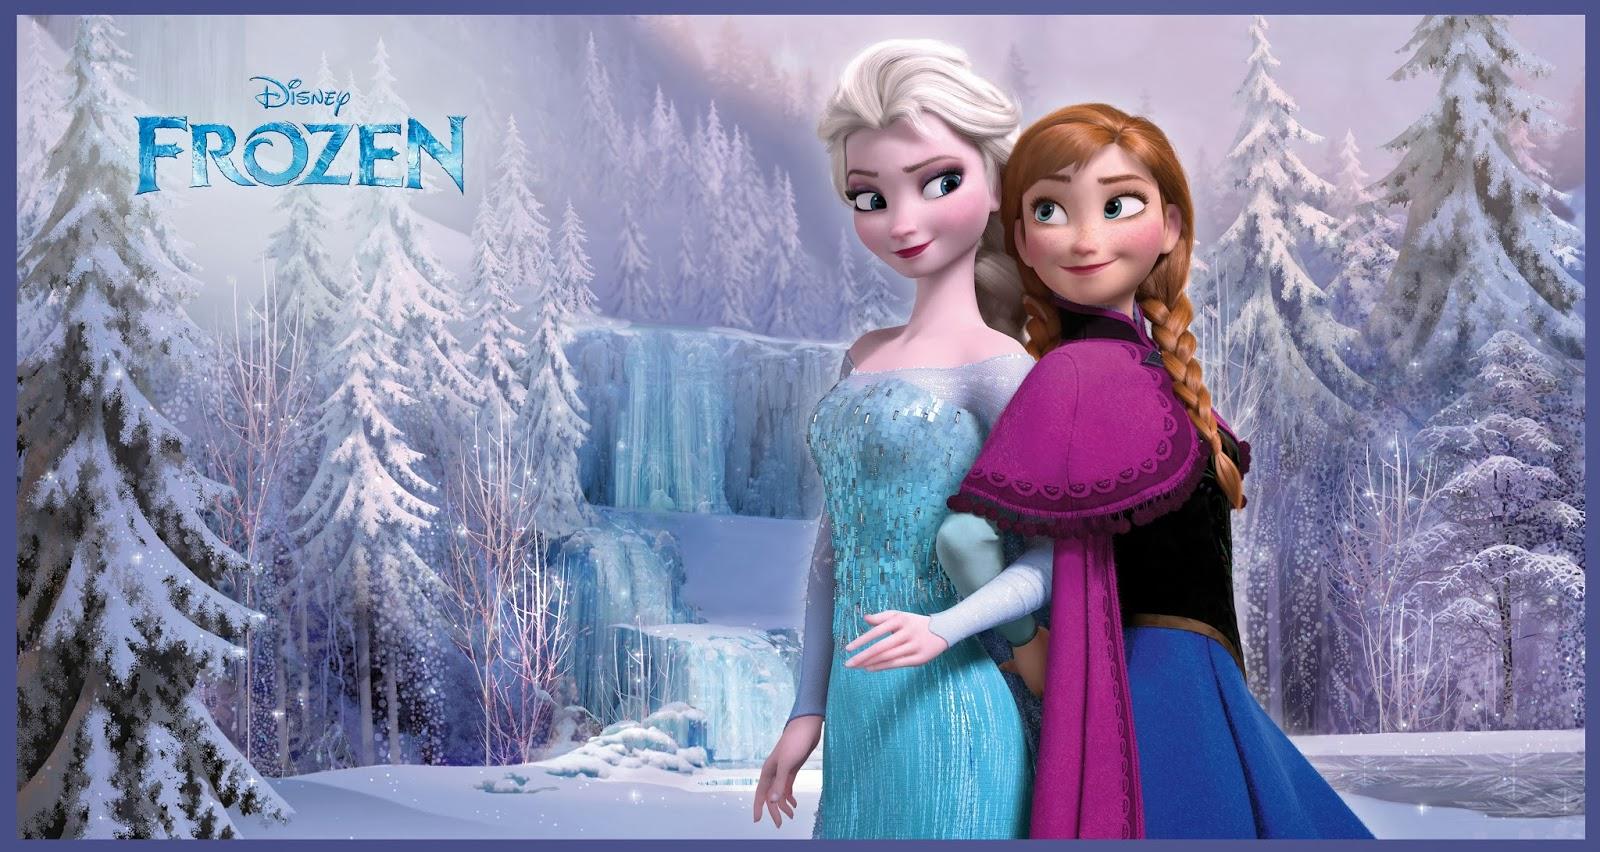 Dessins en couleurs imprimer la reine des neiges - Reine des neige 2 ...